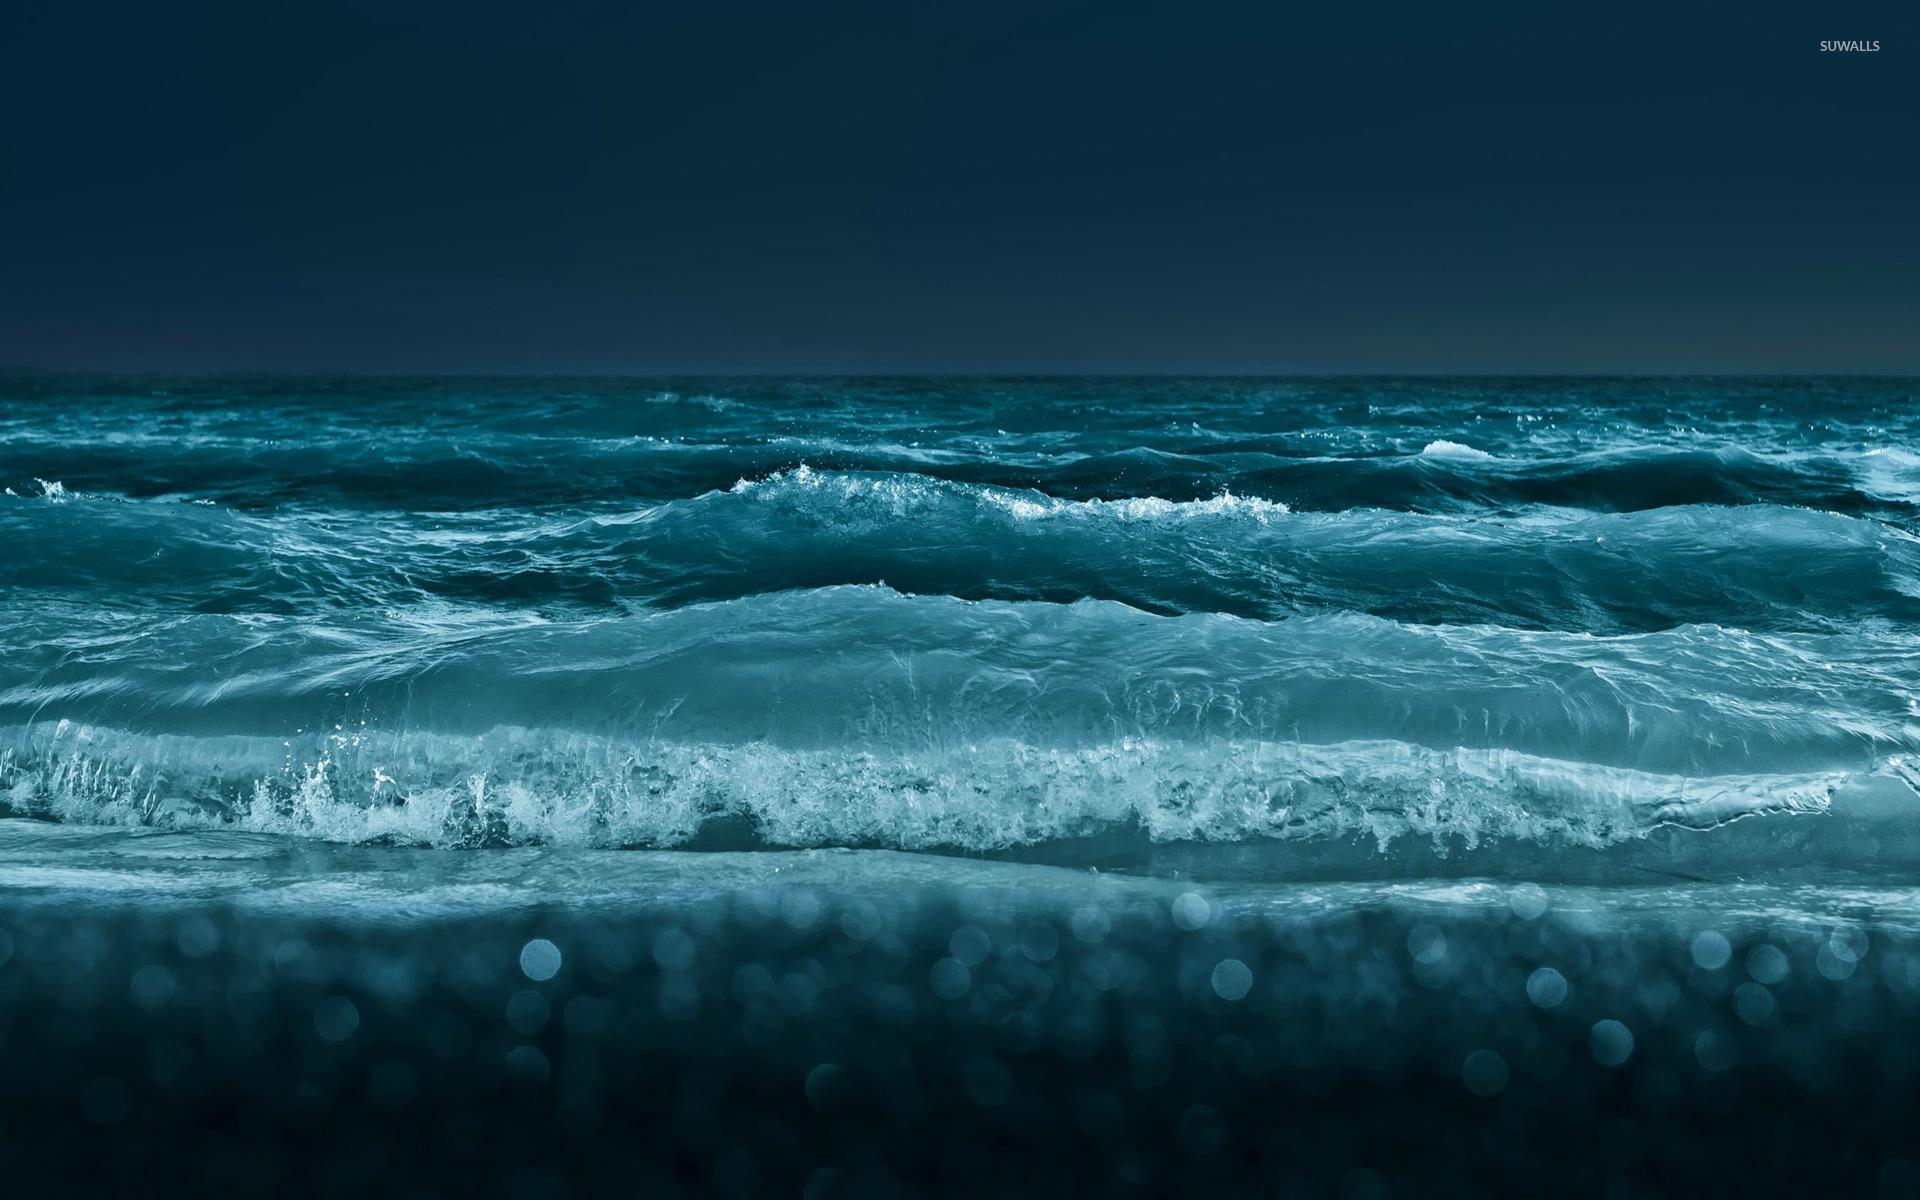 Ocean Waves Wallpaper